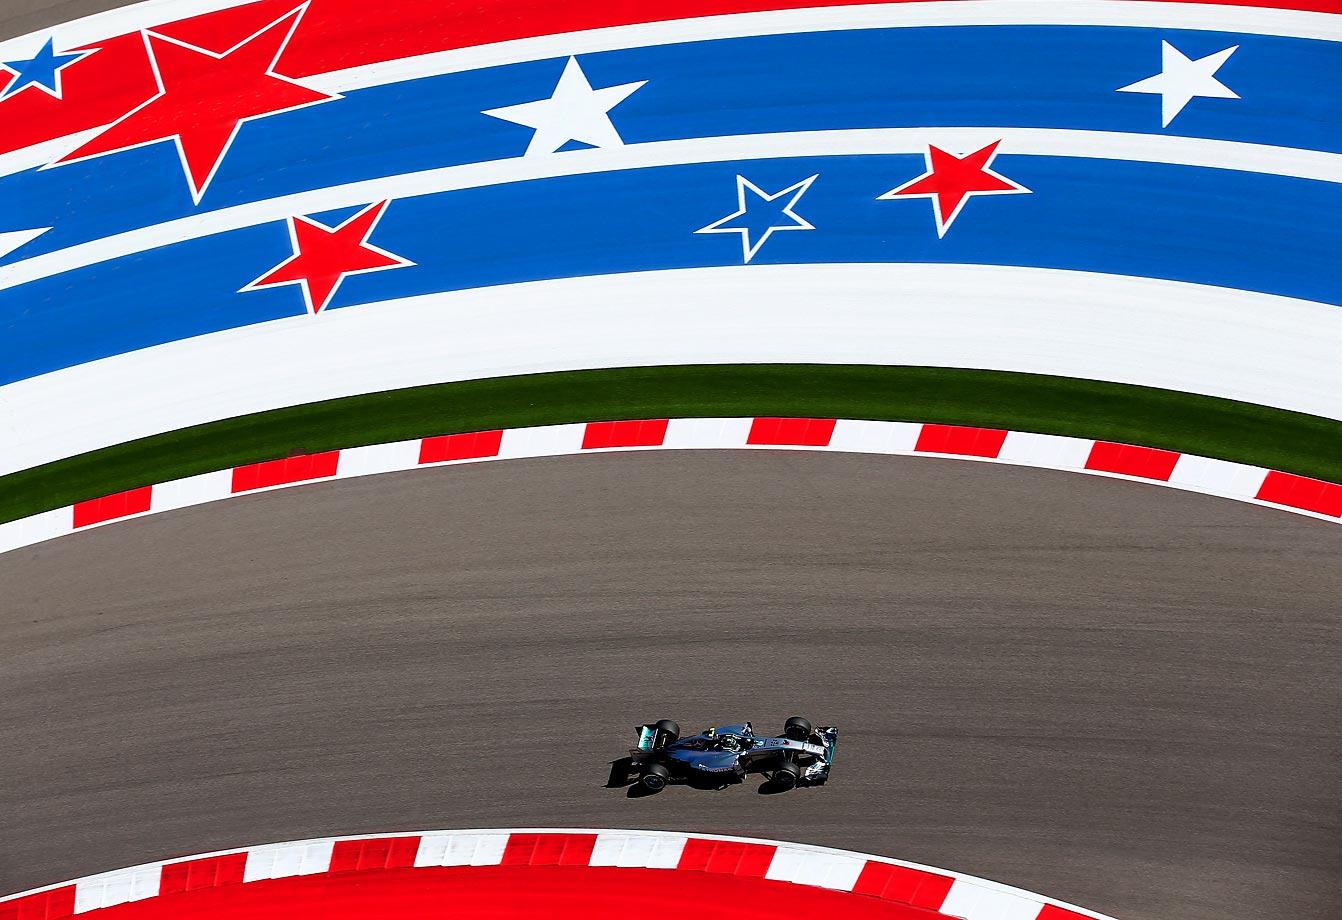 Nico Rosberg of Mercedes GP practices for the U.S. Grand Prix in Austin, Texas.